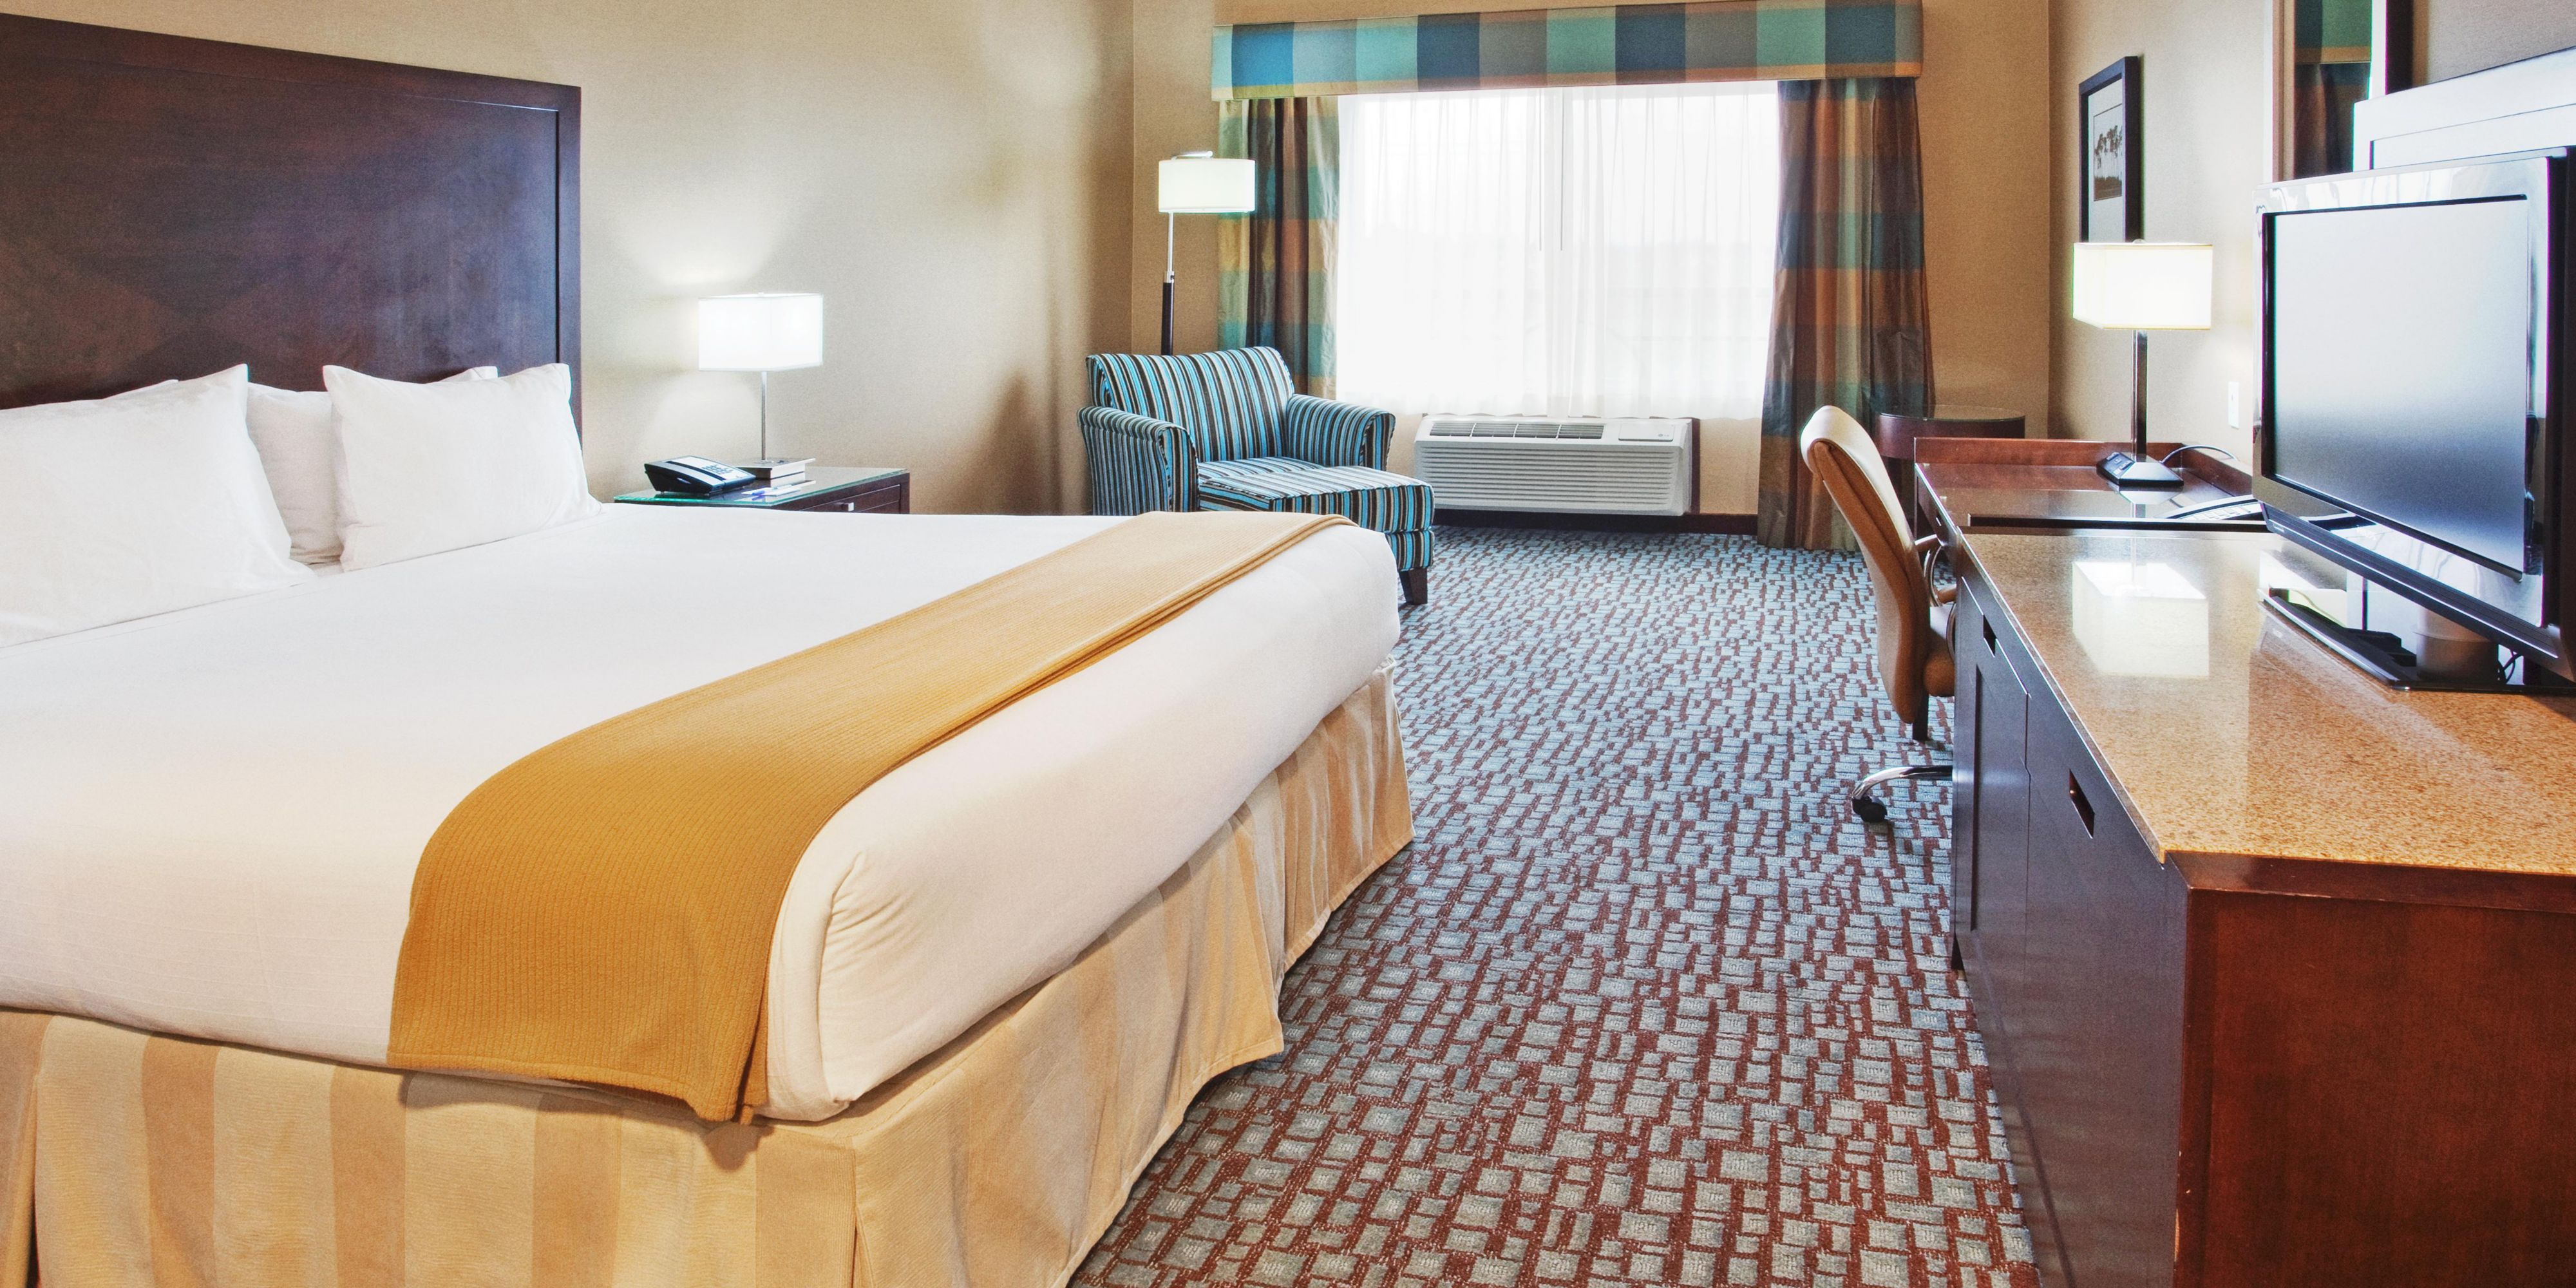 Holiday Inn Express And Suites Salinas 2532714205 2x1